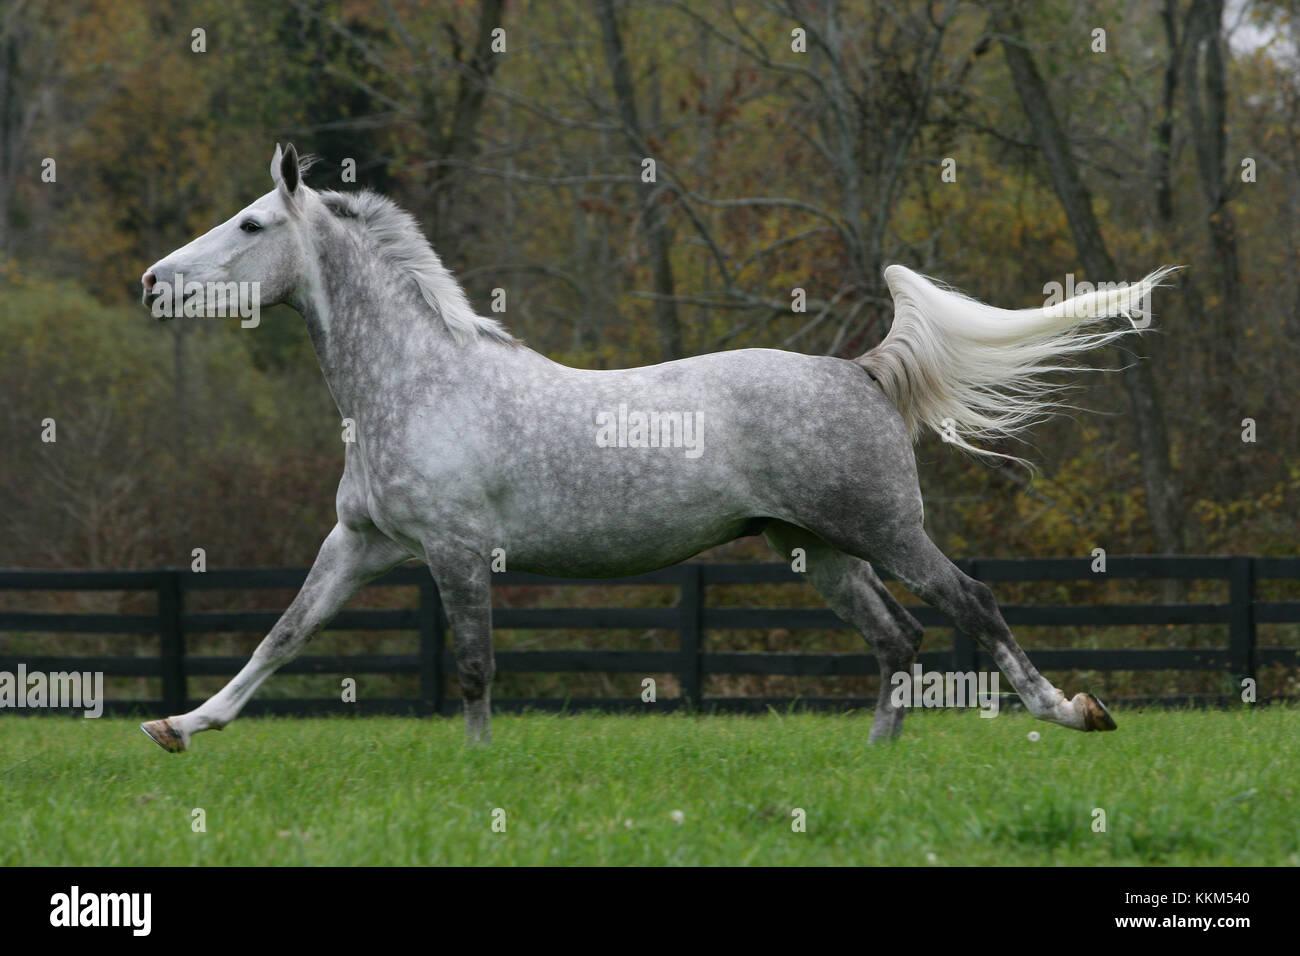 Dapple Grey Oldenburg Cantering - Stock Image